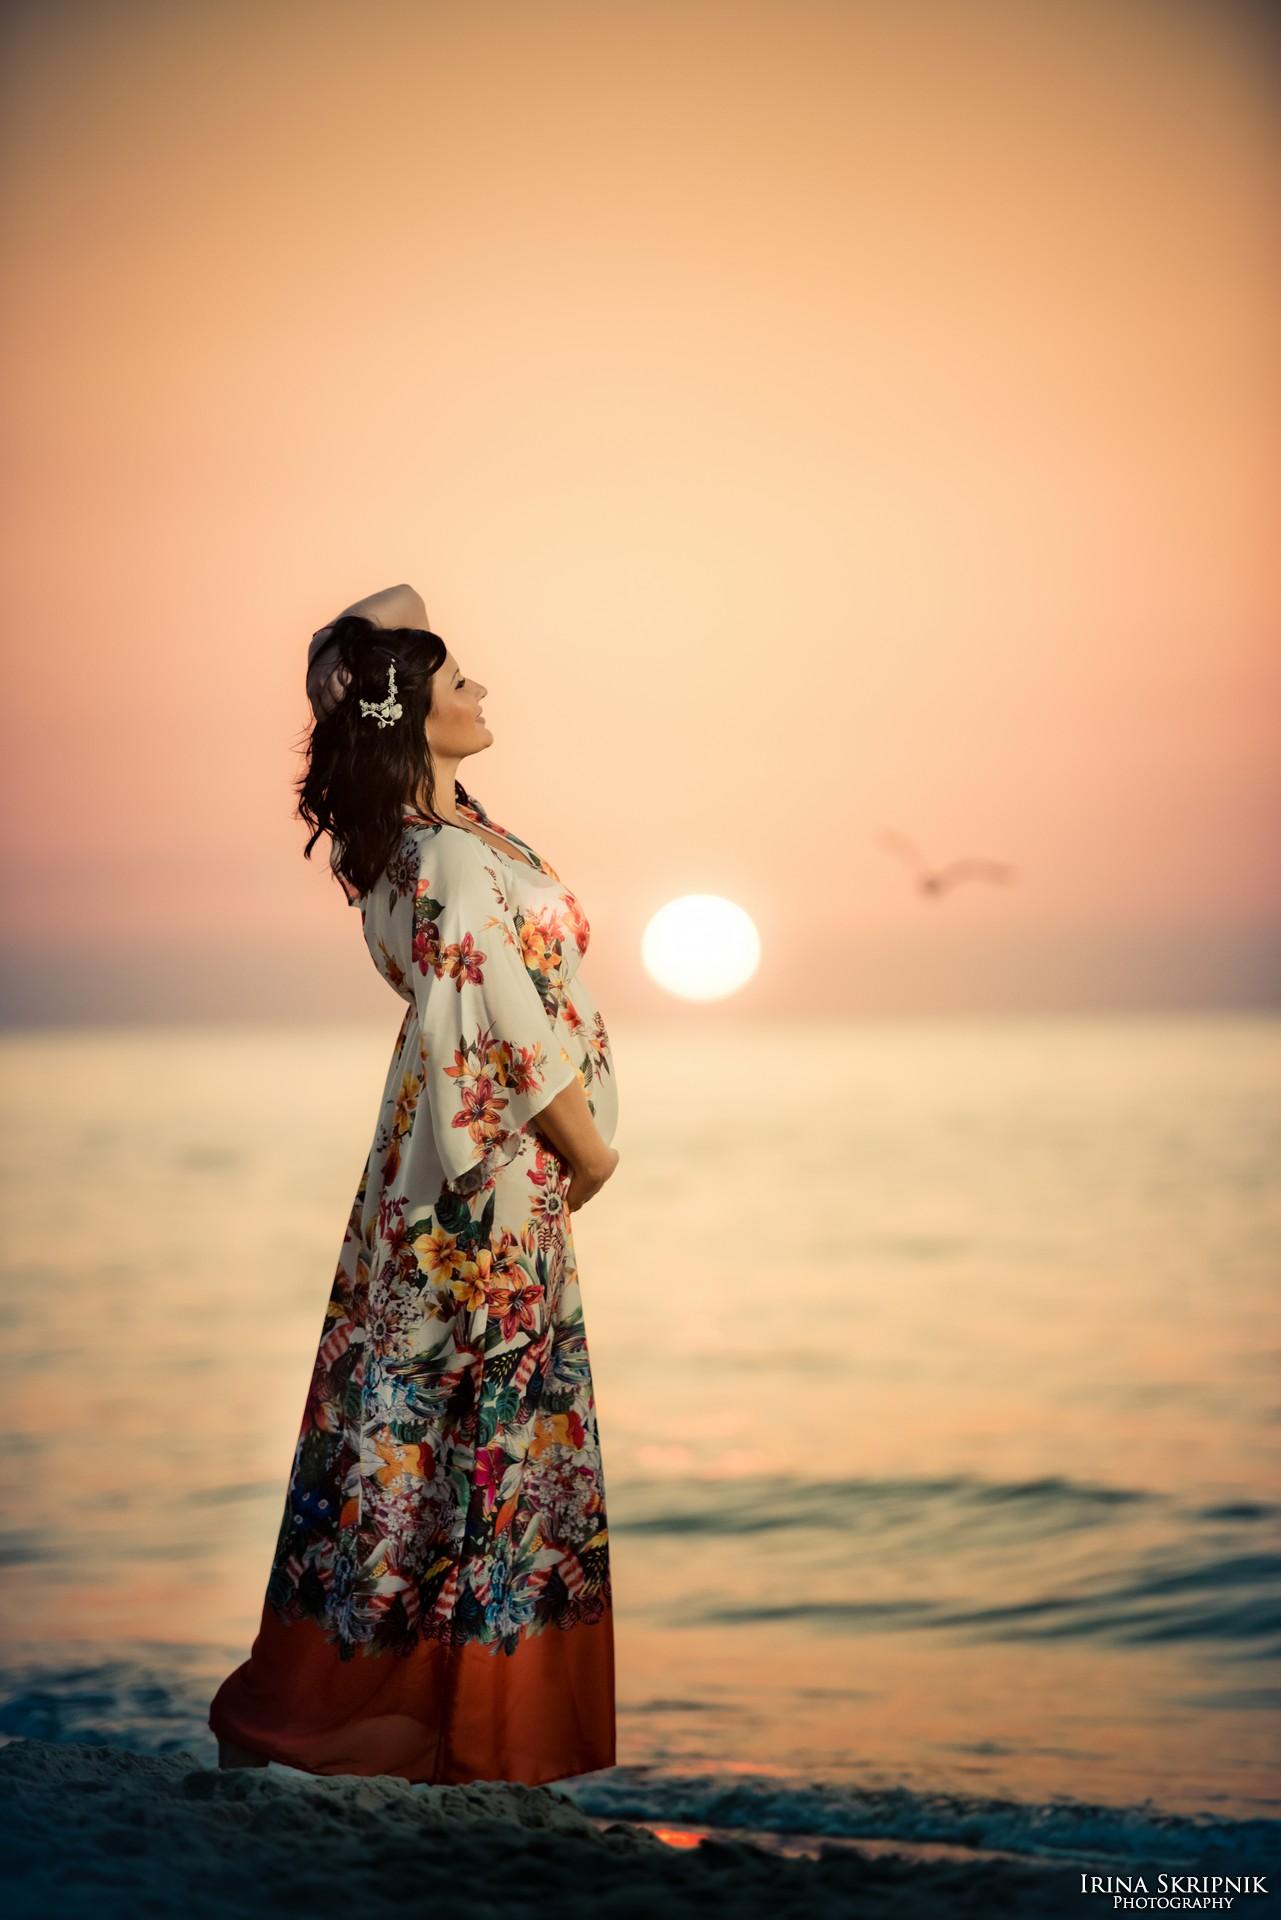 Irina Skripnik Photography 10076